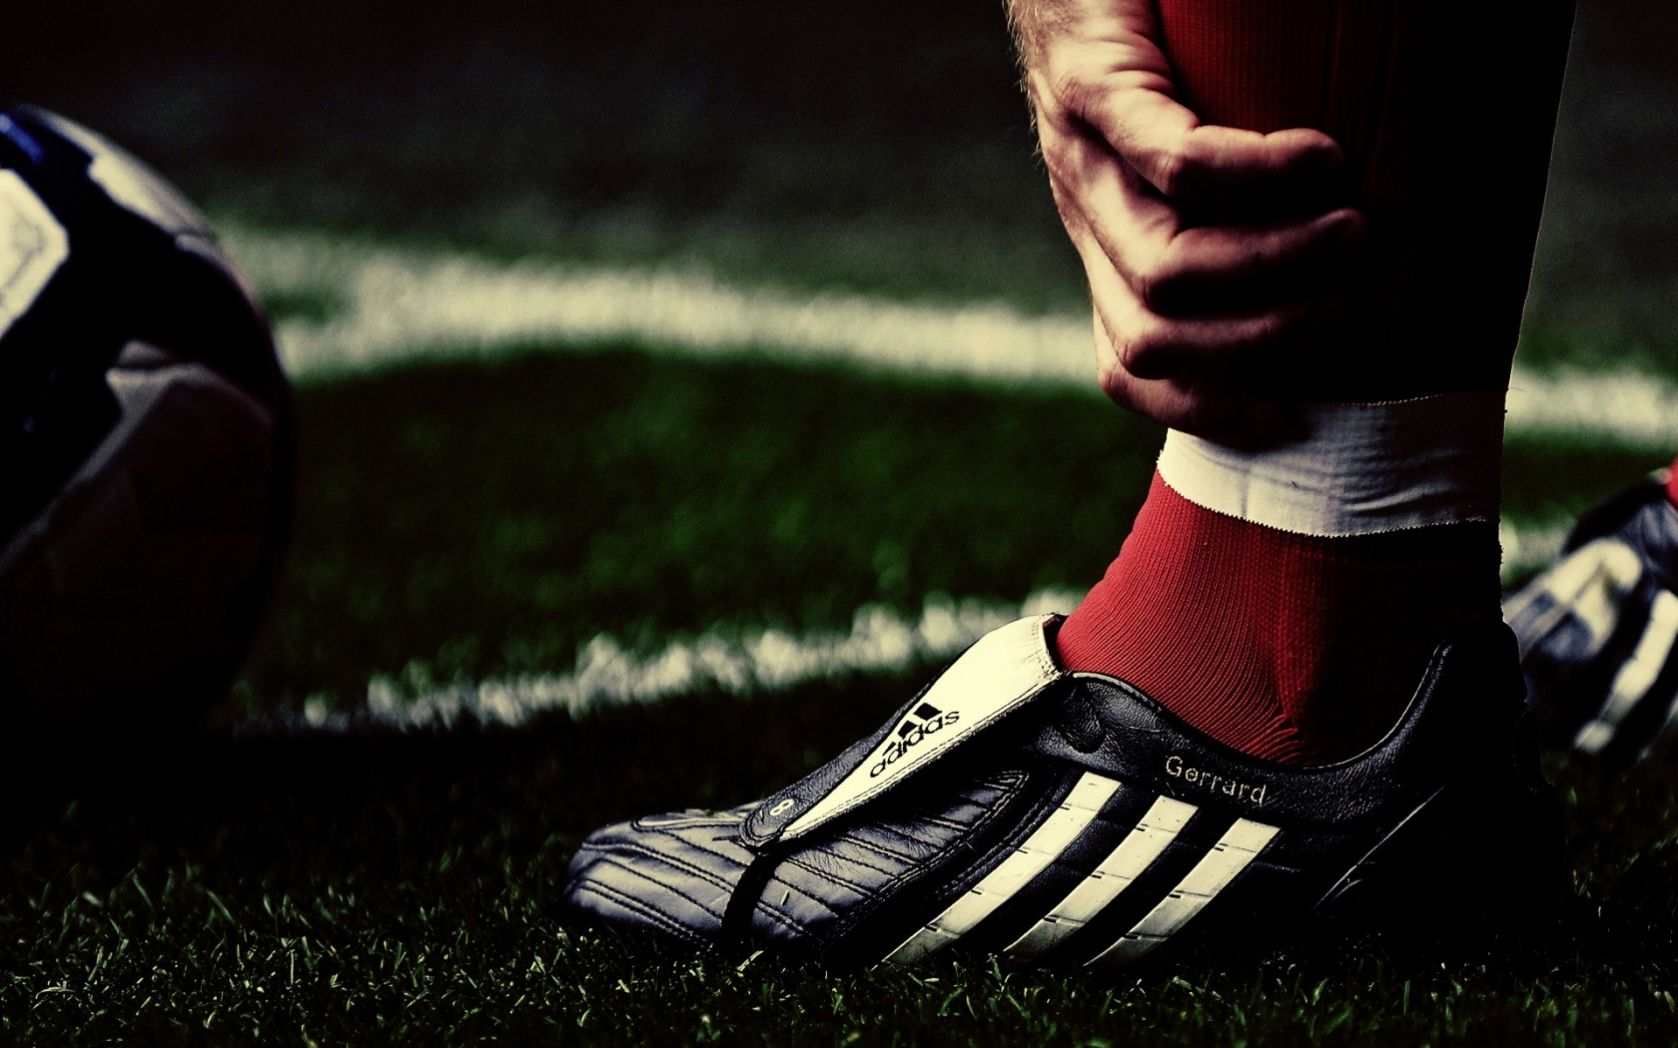 Adidas Soccer Shoe HD Wallpaper